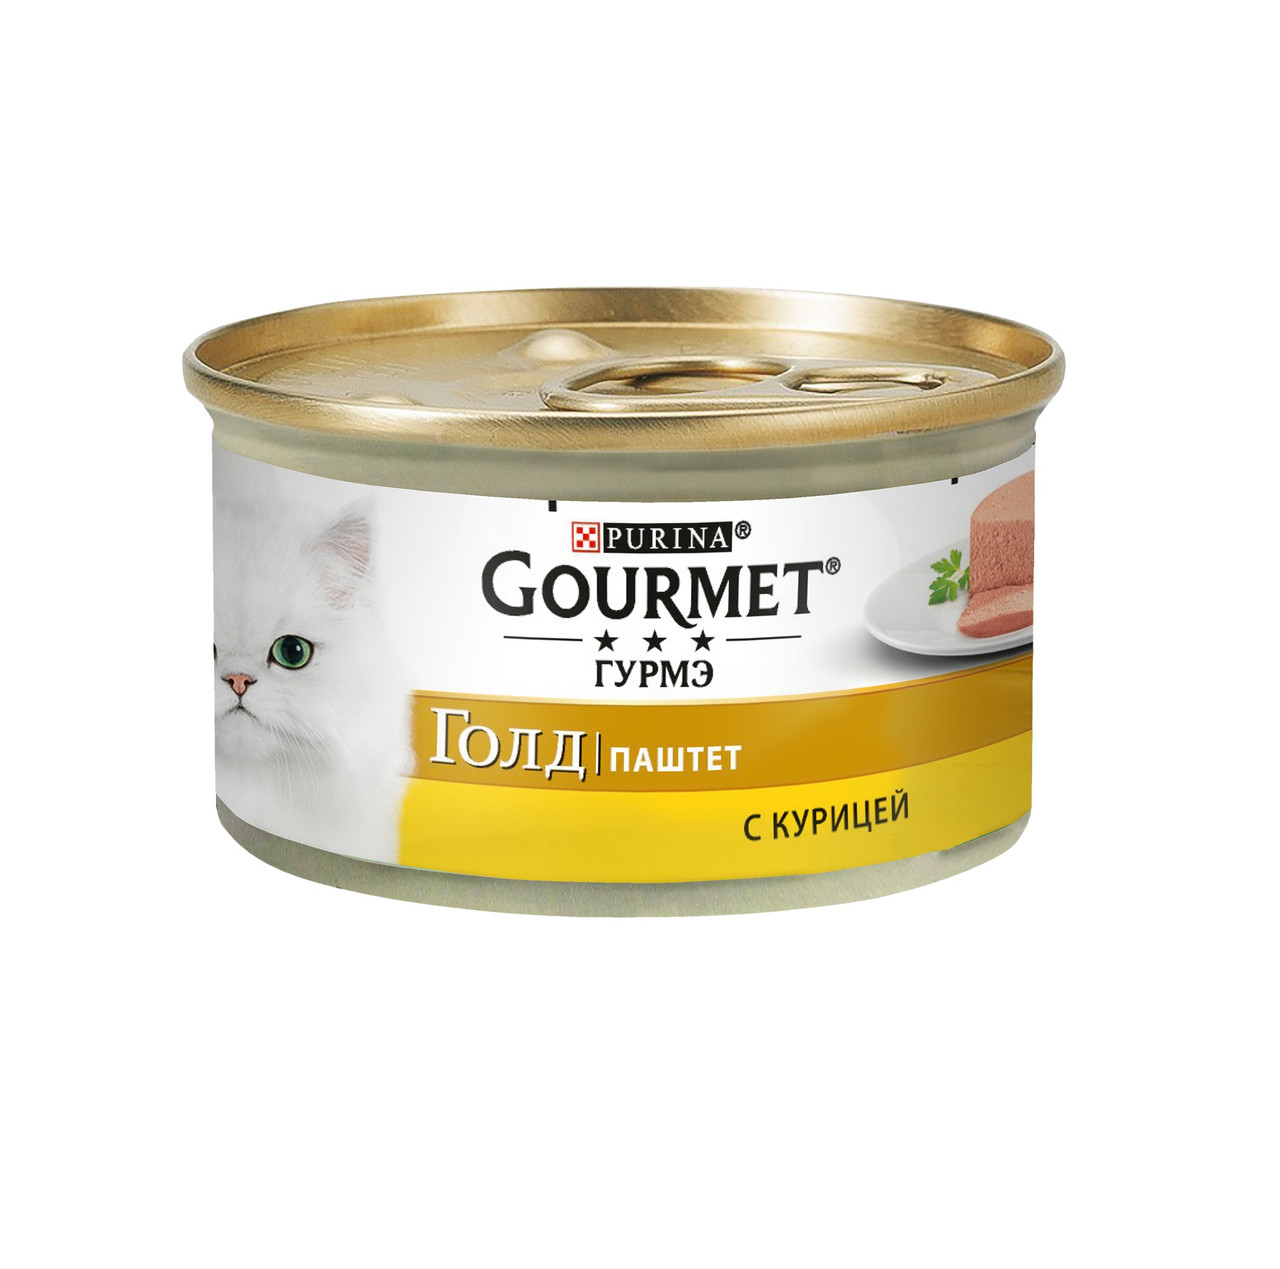 Gourmet Gold паштет с курицей, банка 85гр.